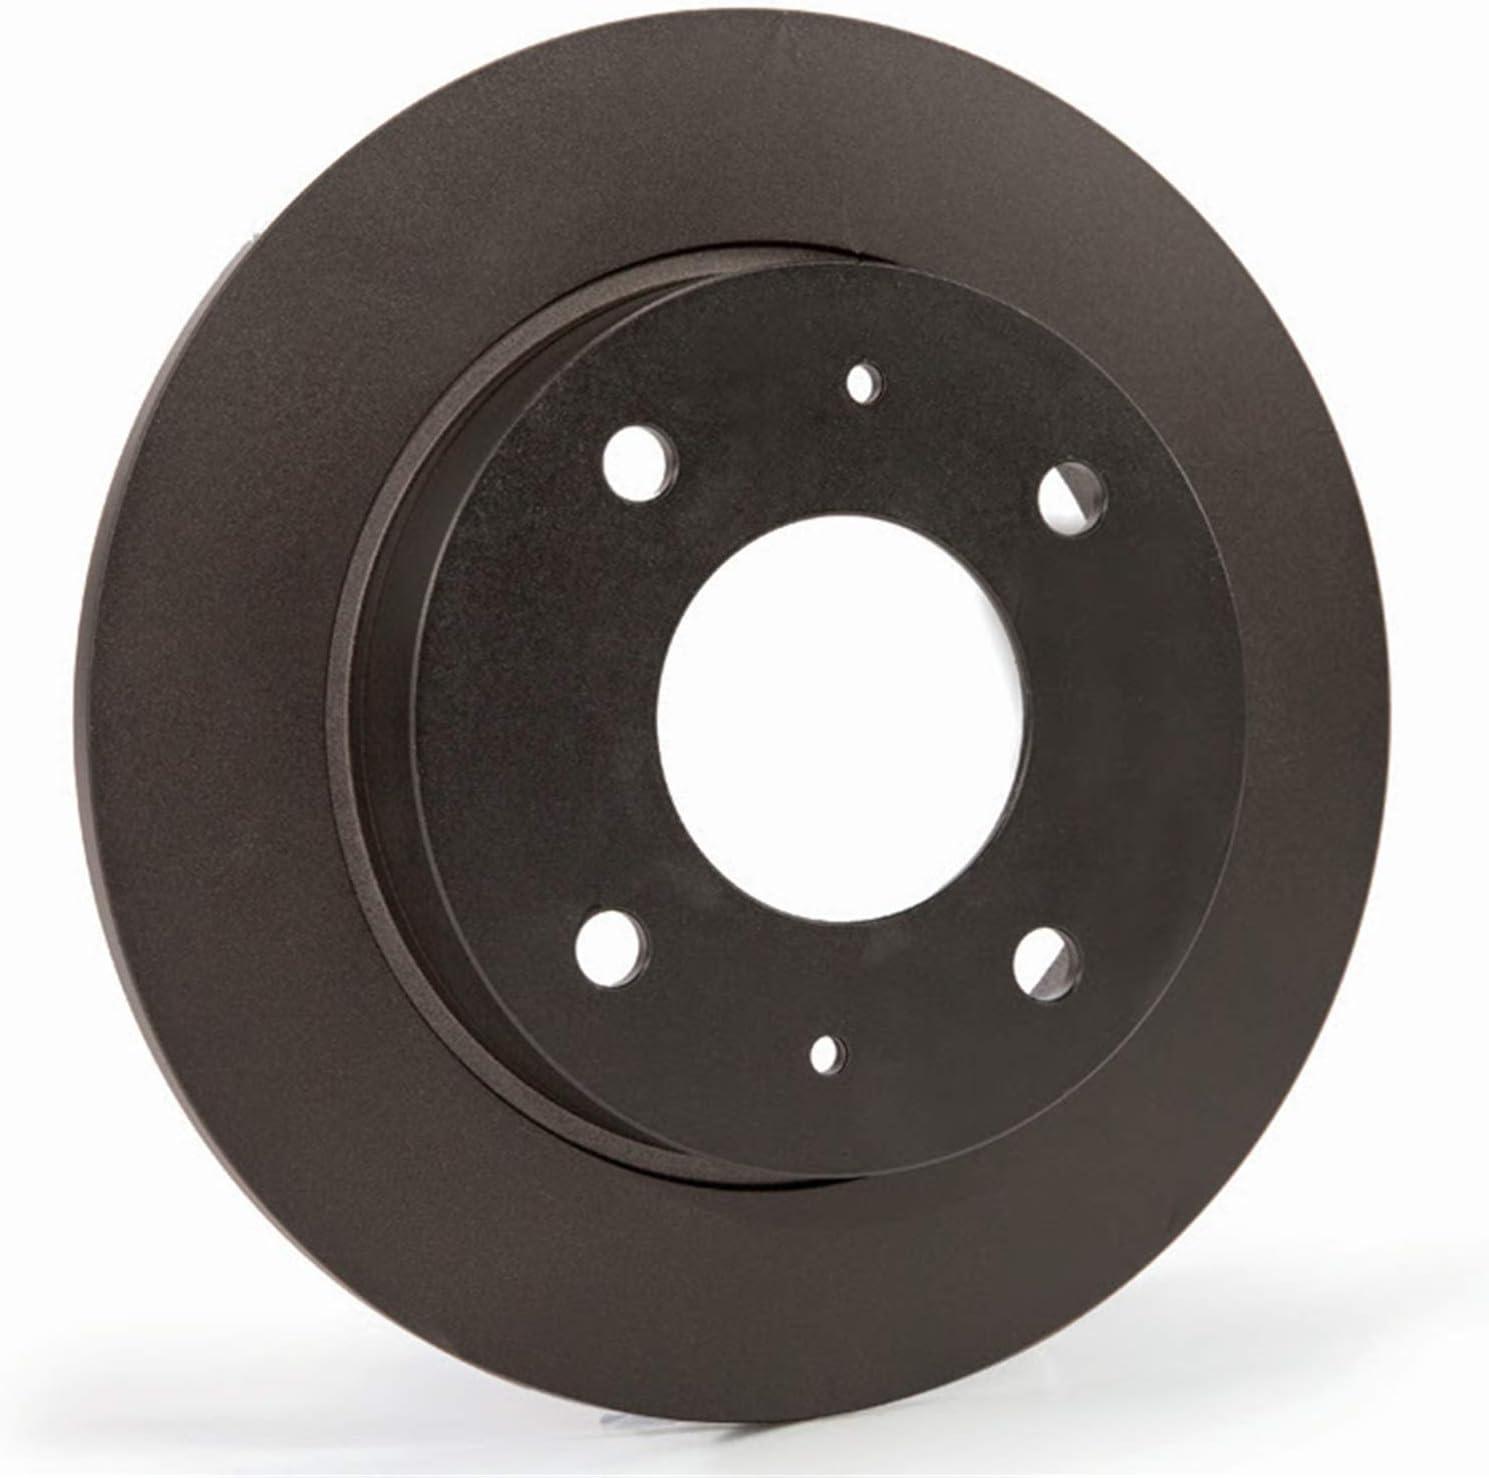 EBC Brakes RK7498 RK Series Many popular brands 35% OFF Brake OE Replacement Rotor Premium